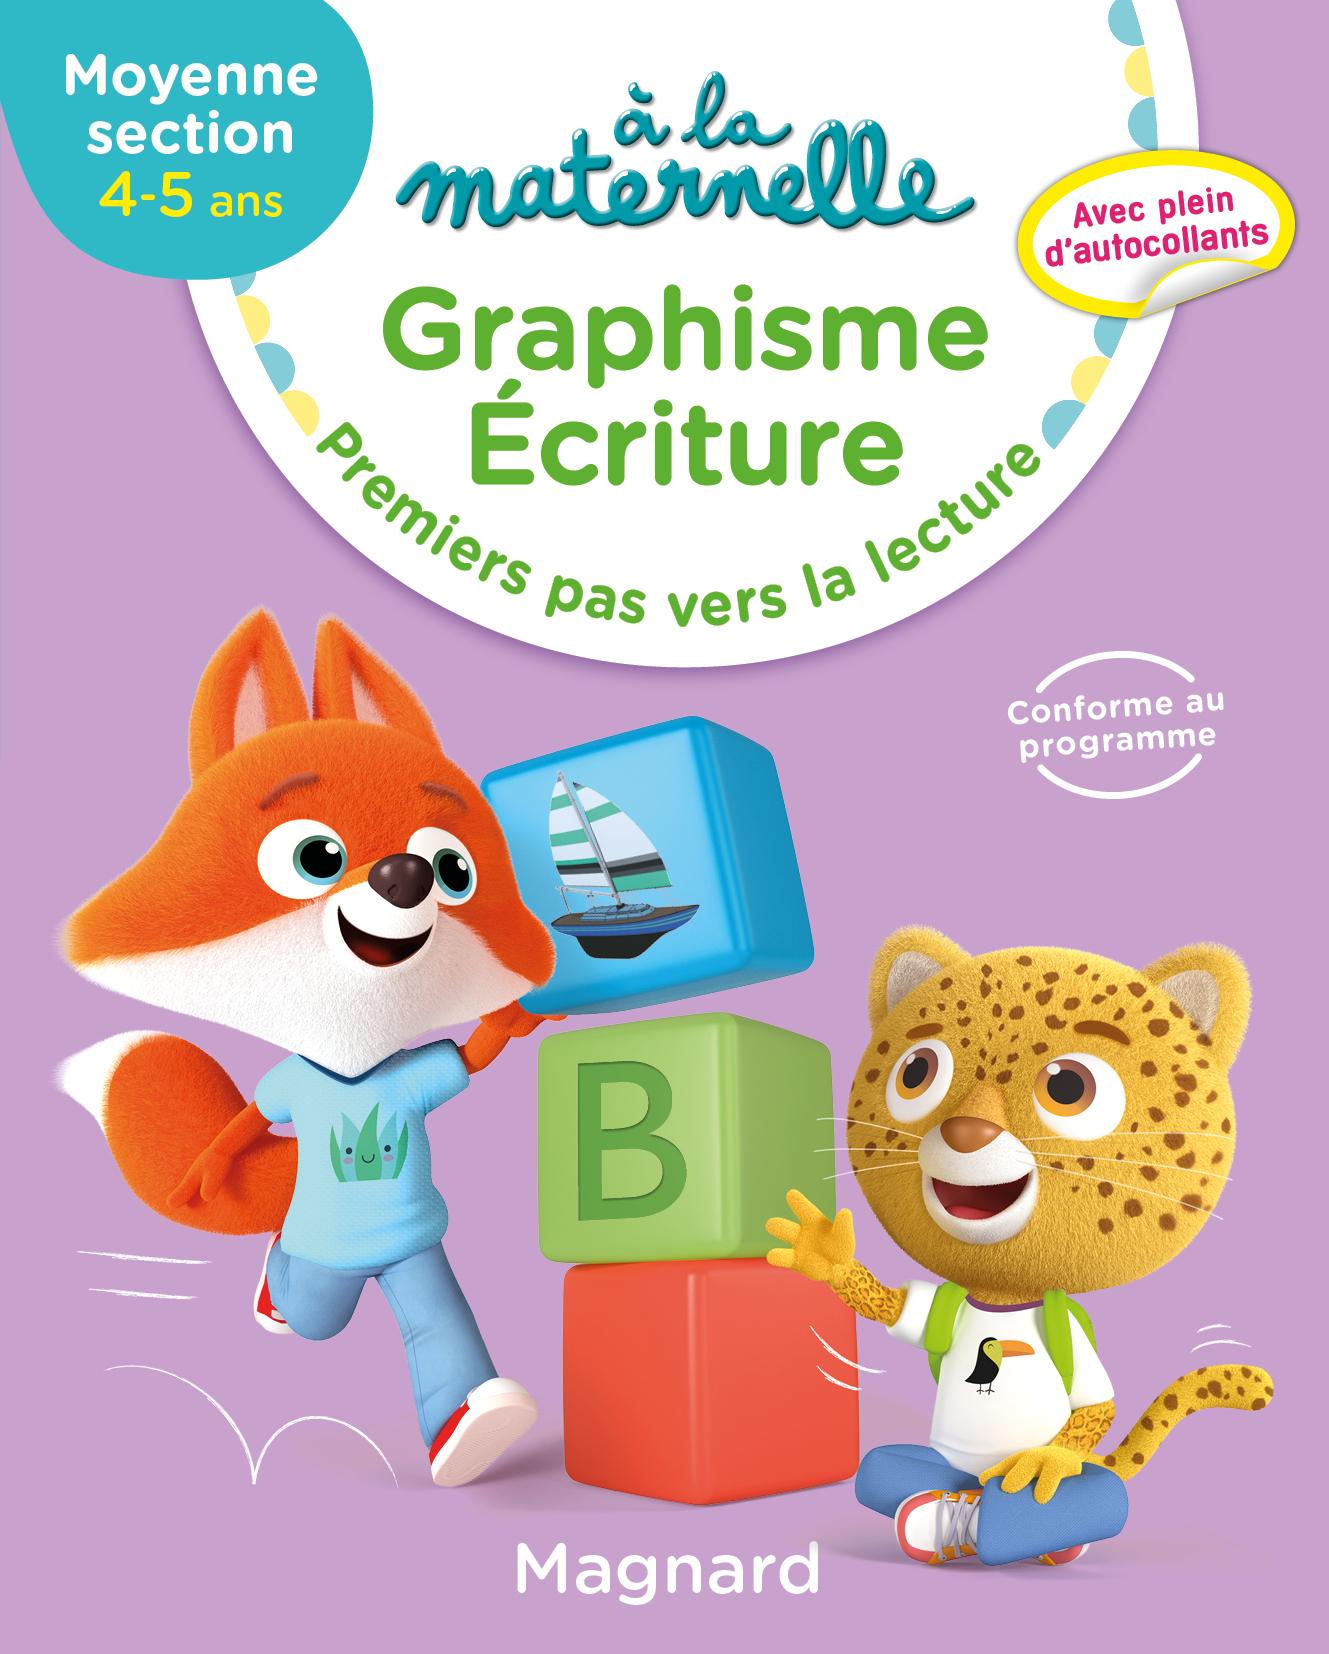 A La Maternelle, Graphisme Ms | Editions Magnard concernant Livre Graphisme Maternelle